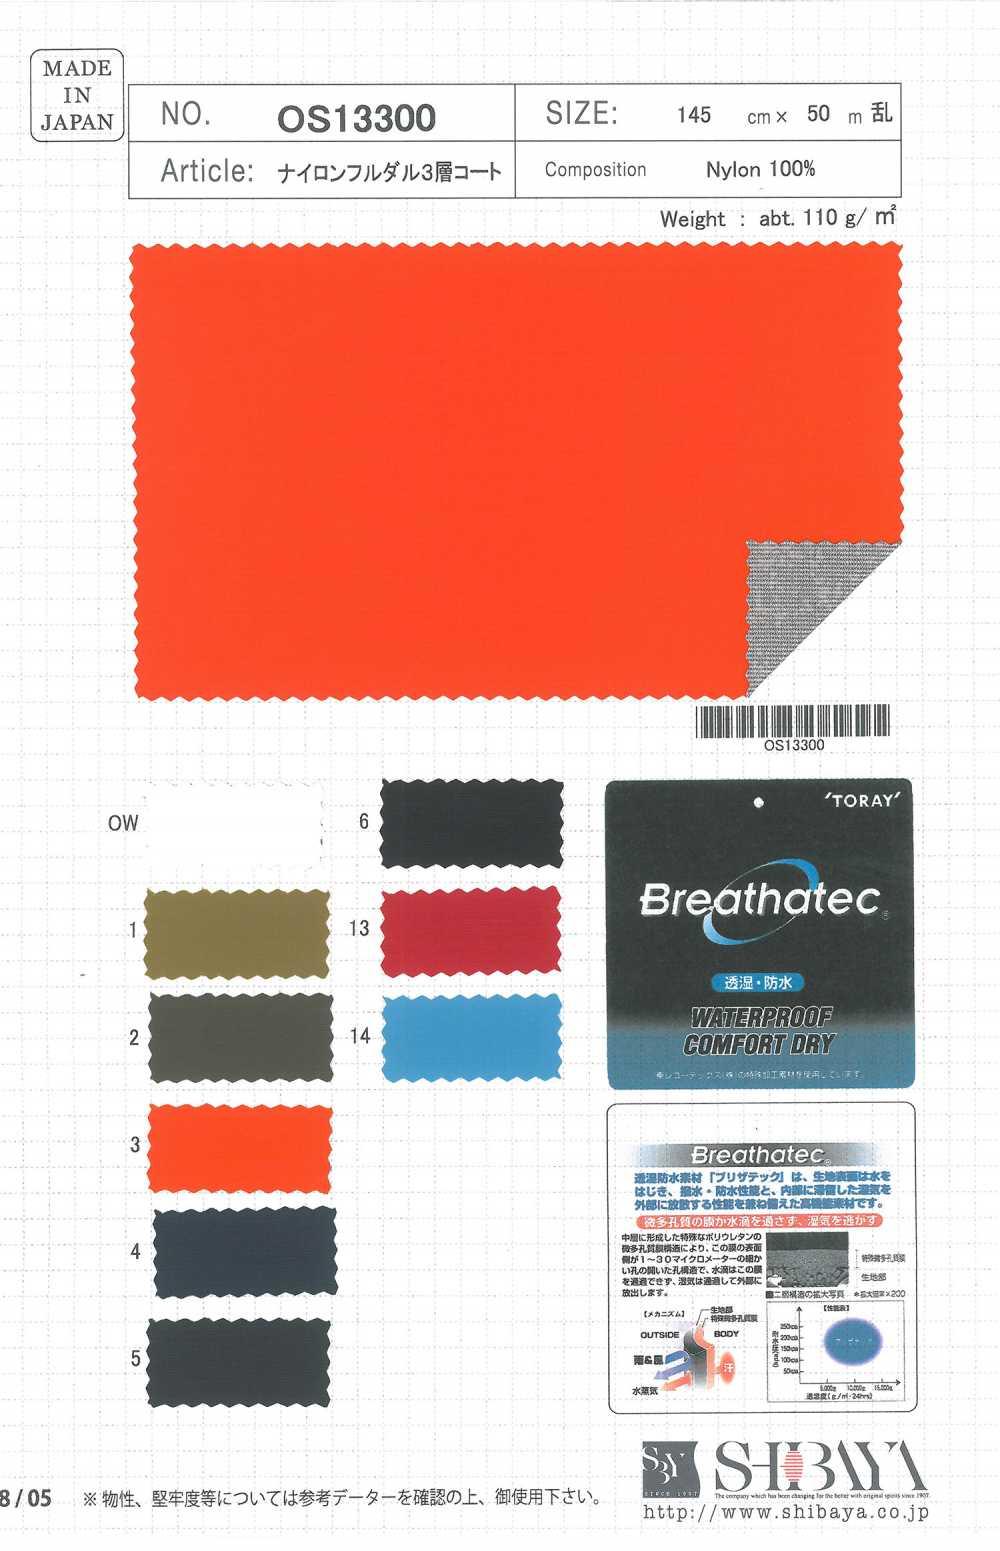 OS13300 ナイロンフルダル3層コート[生地] 柴屋/オークラ商事 - ApparelX アパレル資材卸通販